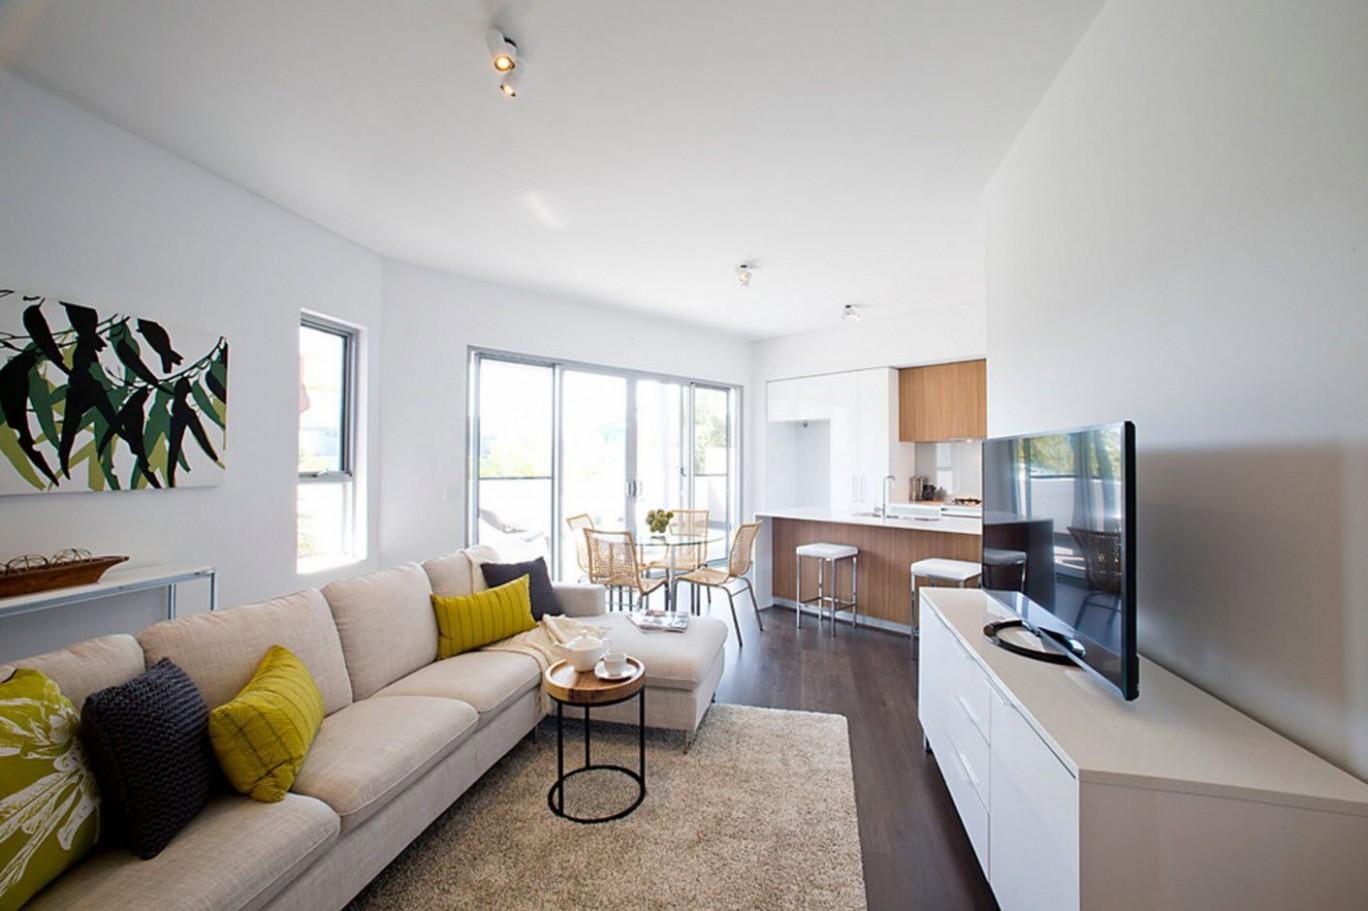 Apartment Interior Design Inspiration Ideas & Trends 11 - Small  - Apartment Design Trends